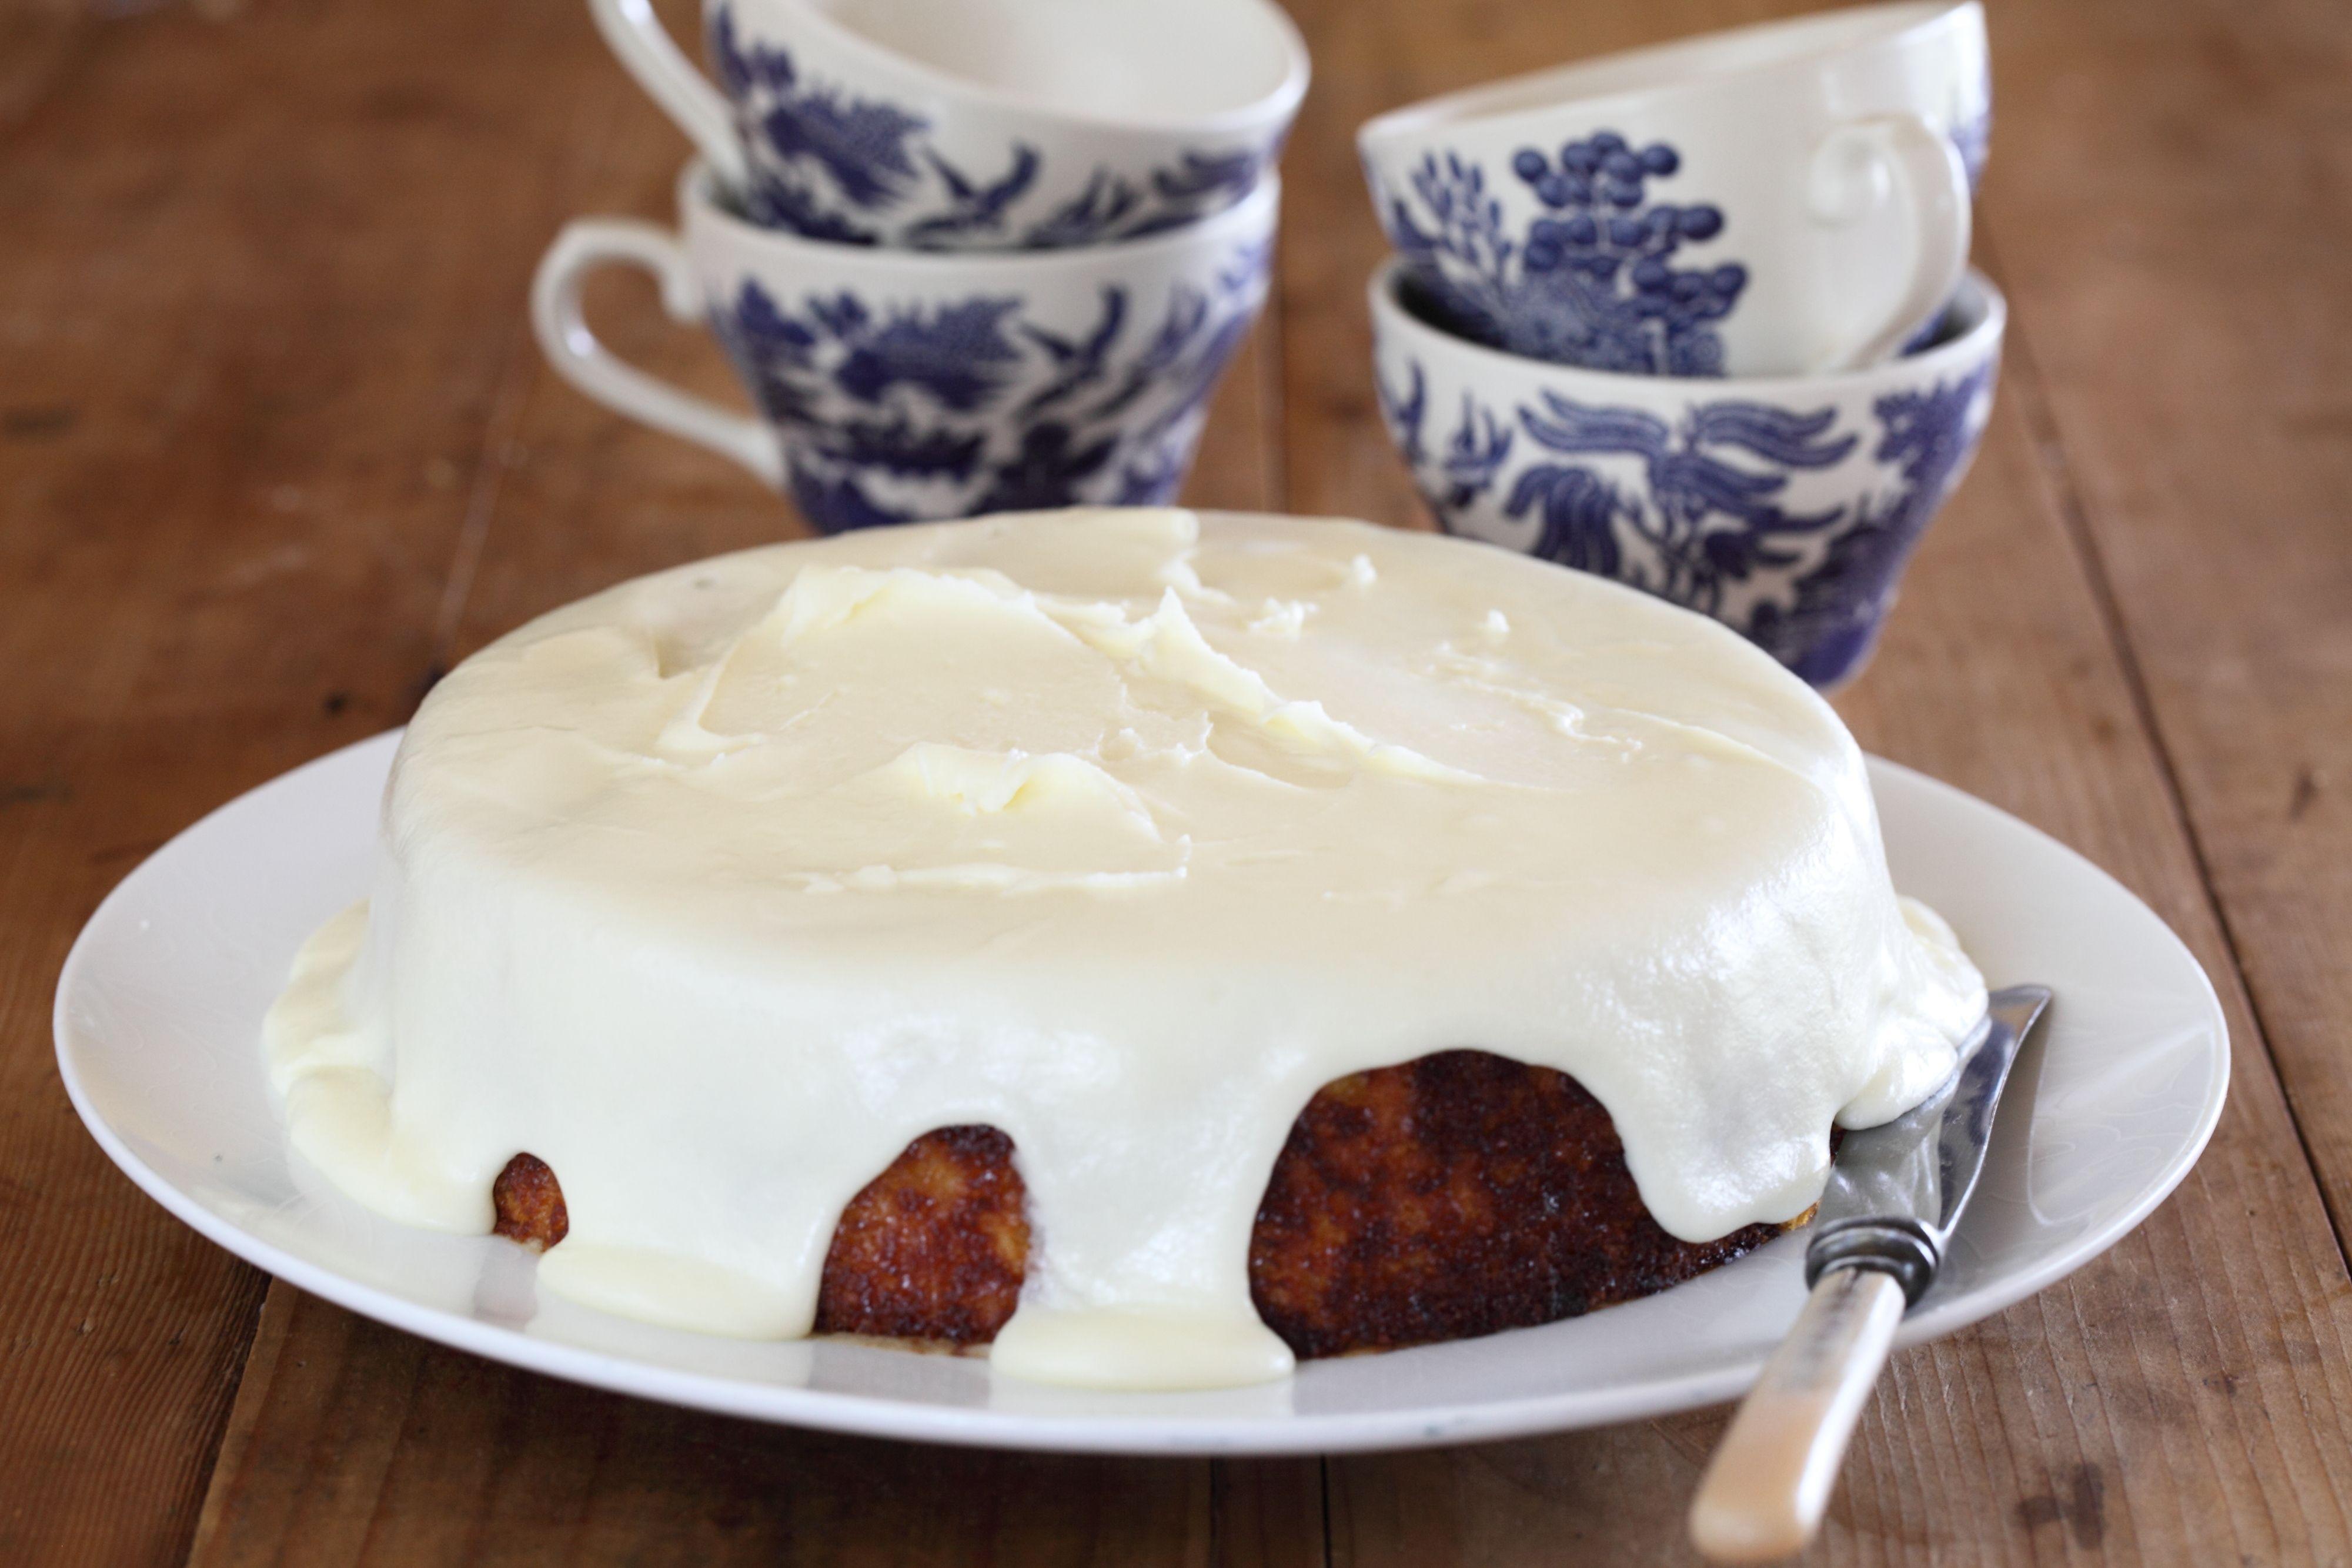 Orange Cake Icing Recipes: Orange Cake With Verjuice Icing - Maggie Beer